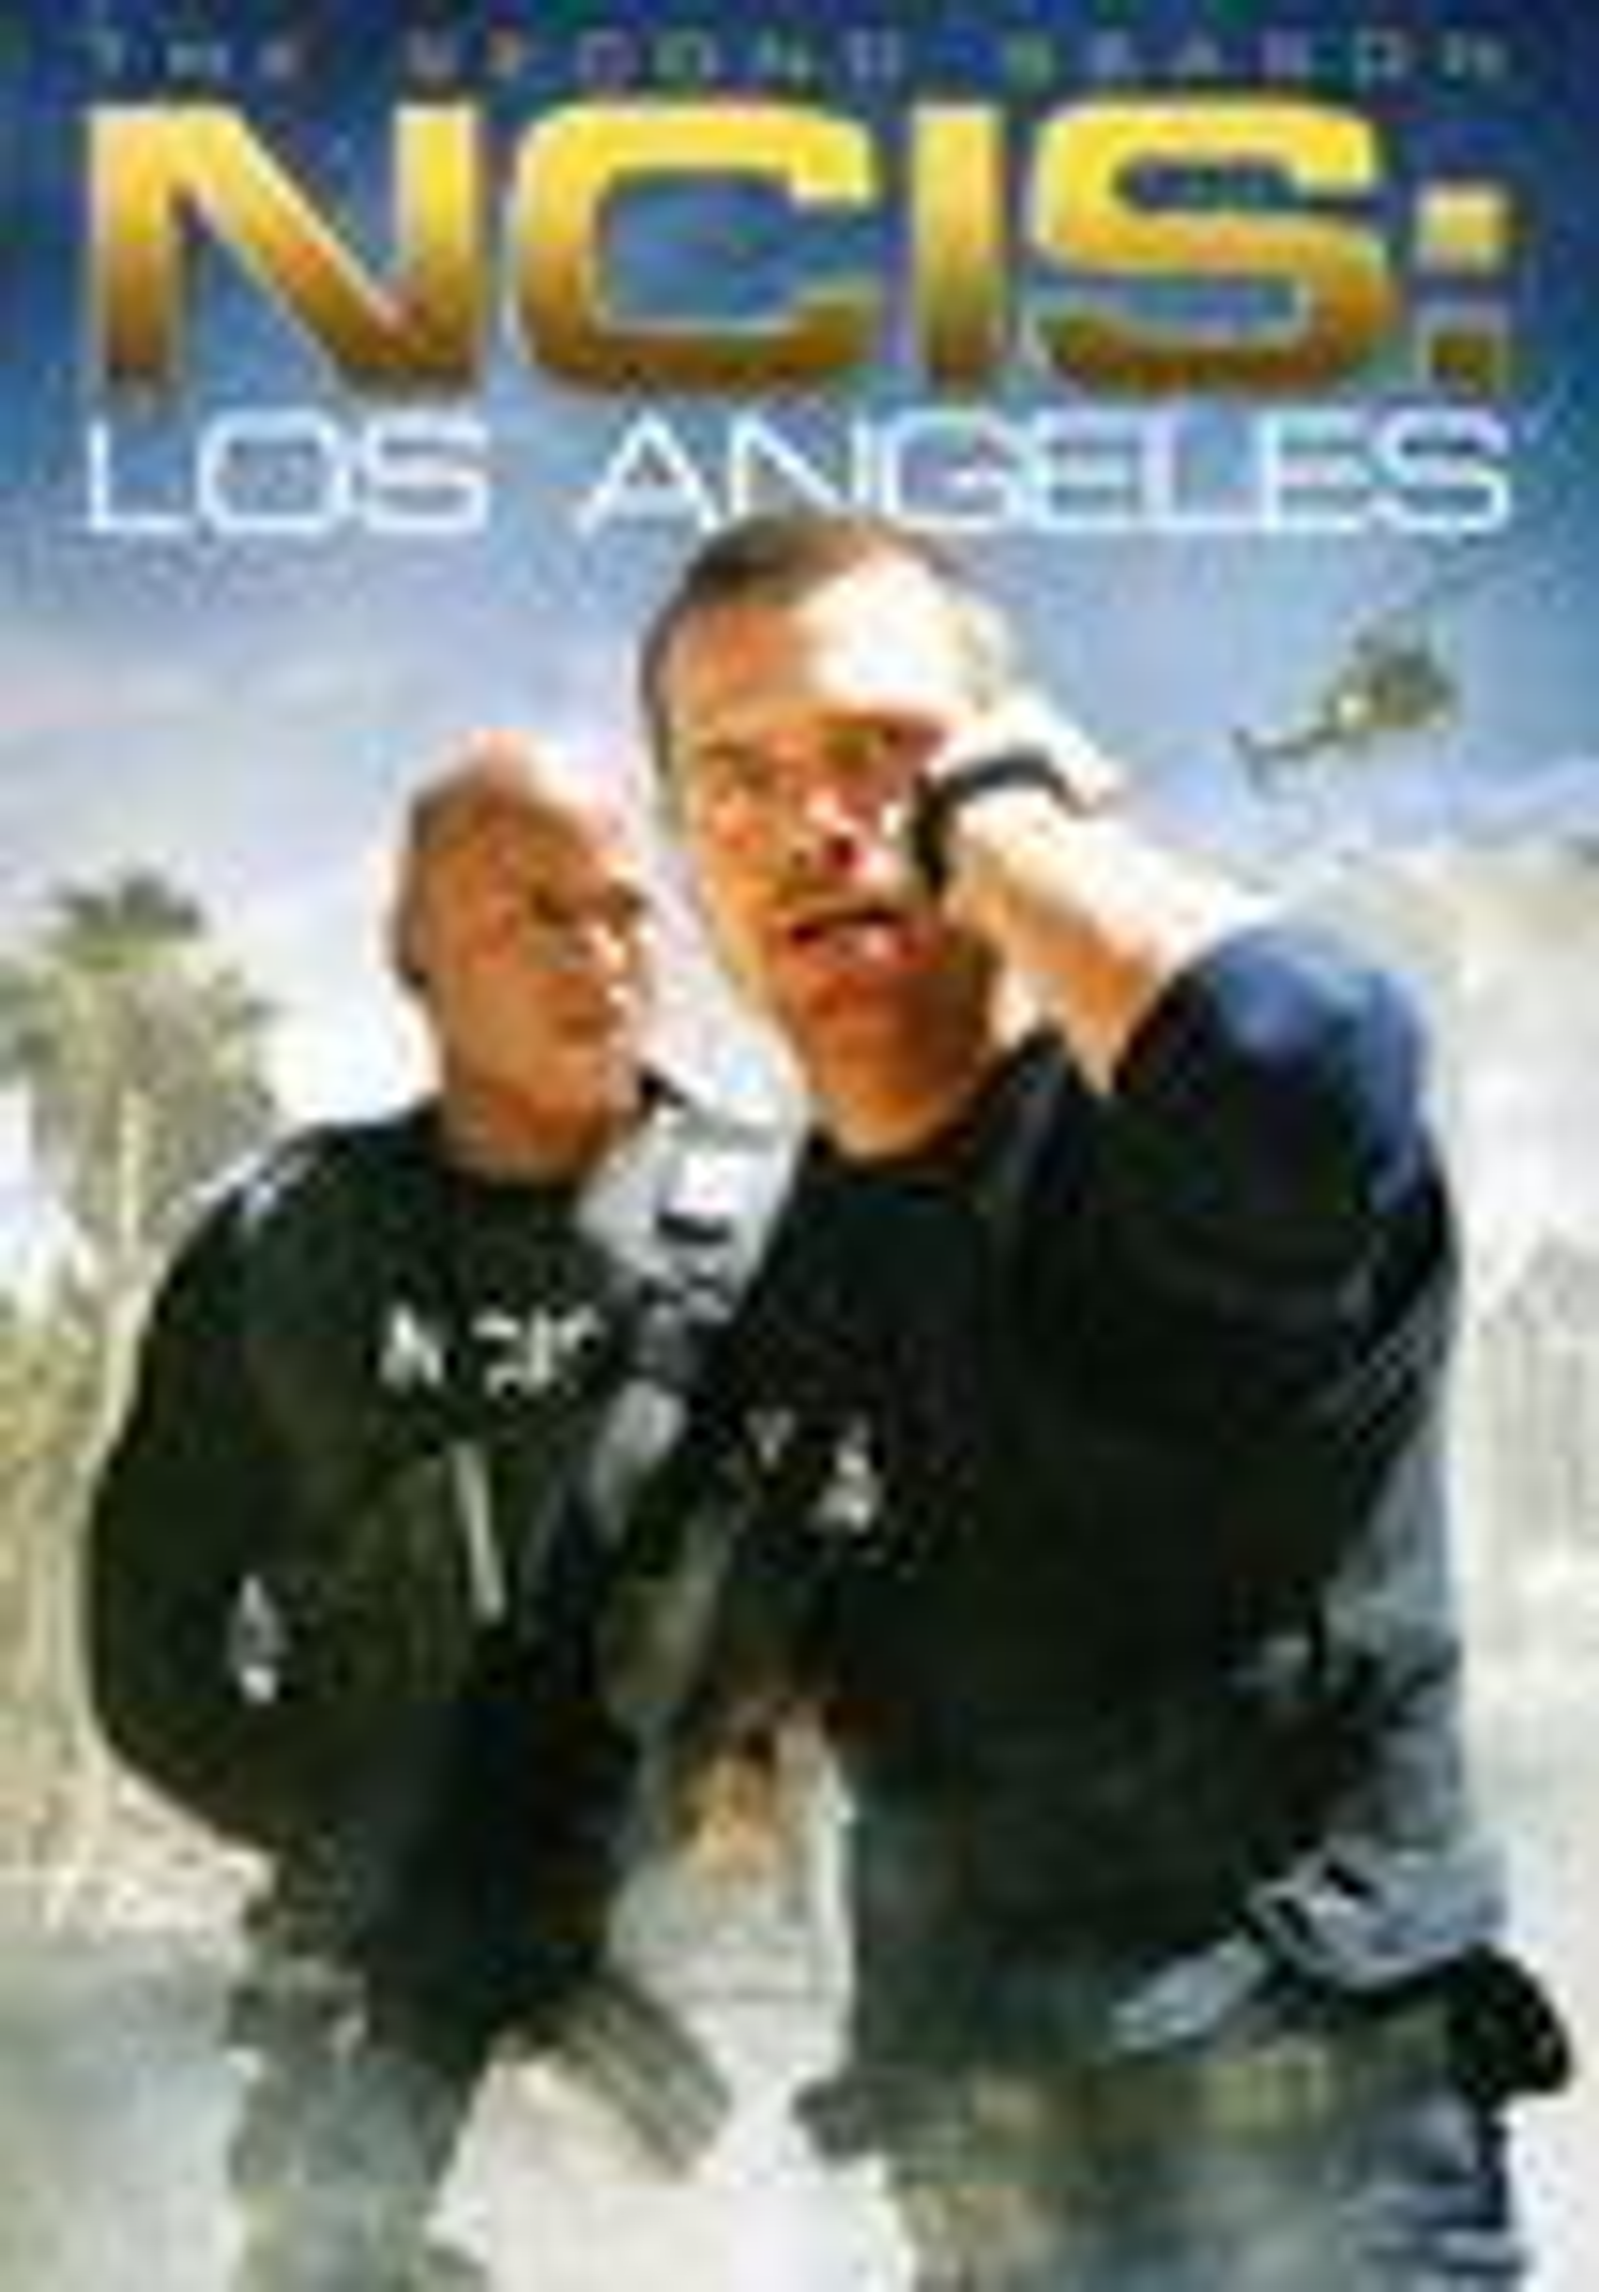 Ncis: Los Angeles - The Second Season [6 Discs] (dvd) 2969565